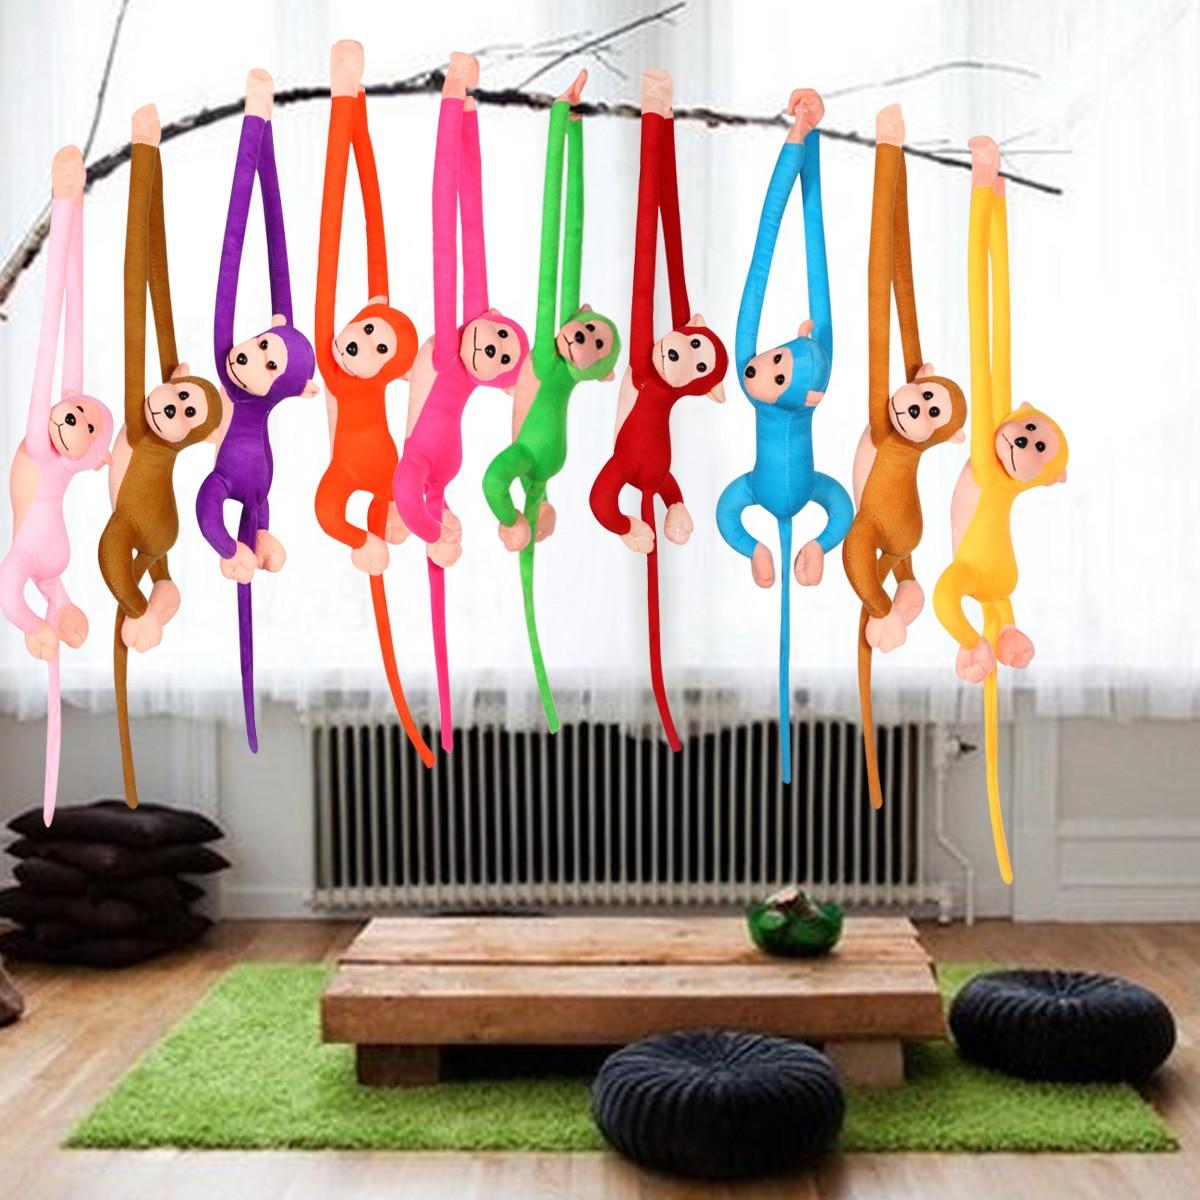 70cm Hanging Monkey Long Arm Plush Toy font b Baby b font Long Arm Stuffed Doll